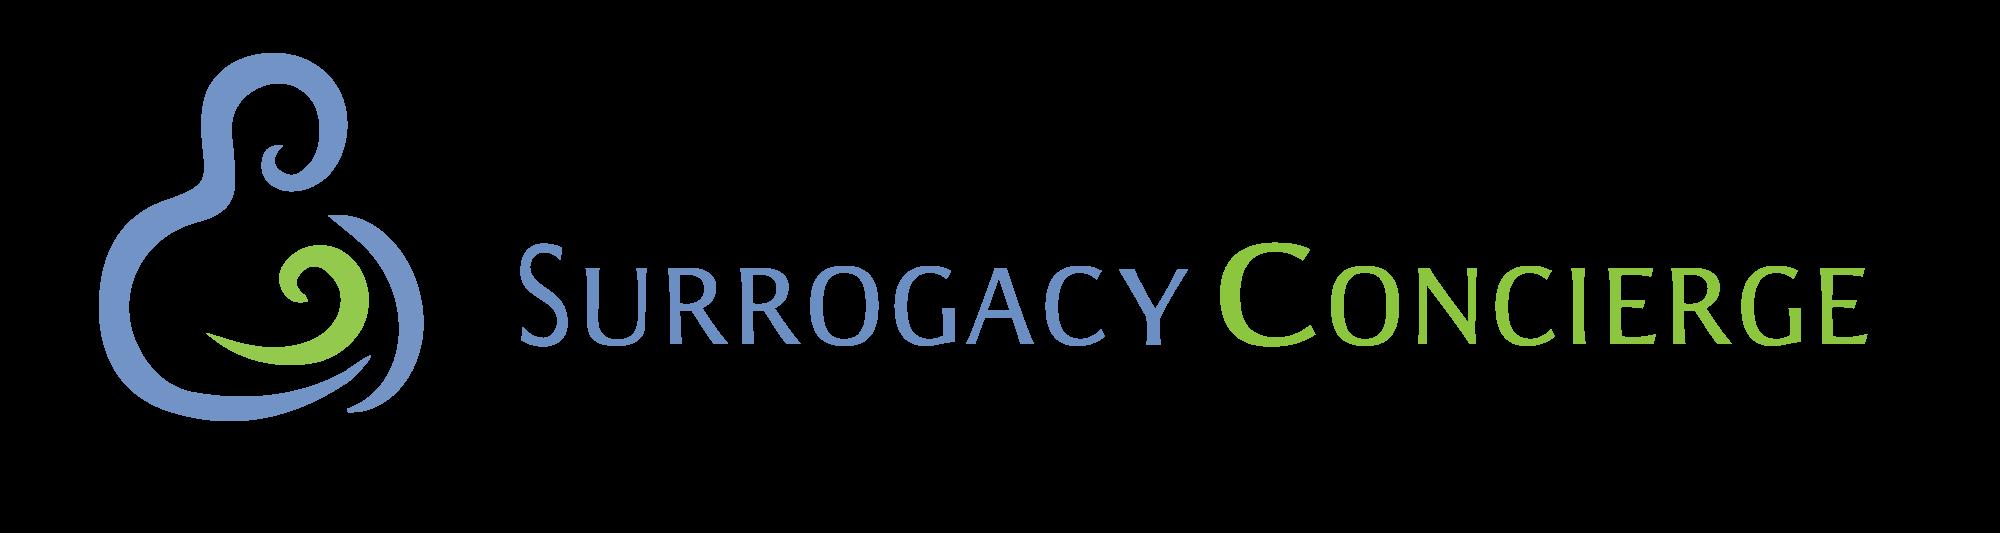 Surrogacy Concierge